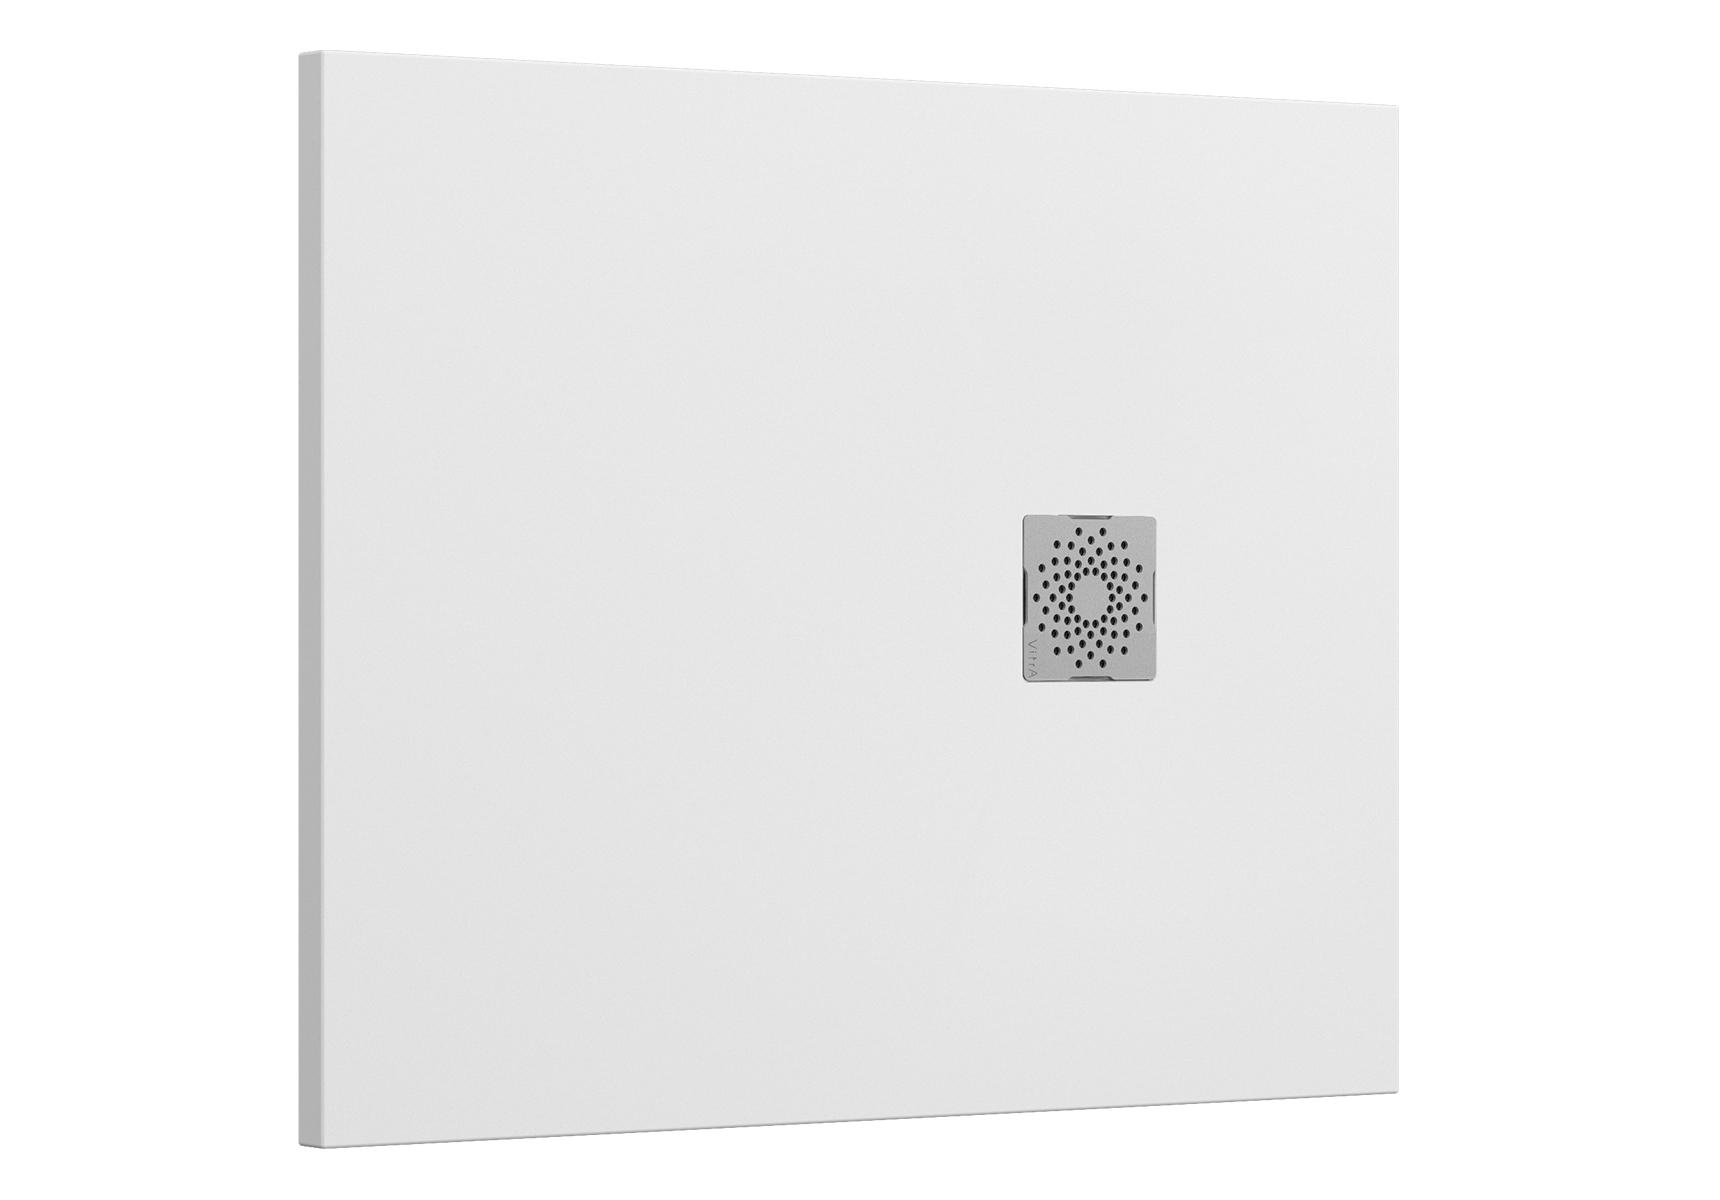 V-Stone Duschwanne, 100 x 80 cm, Weiß